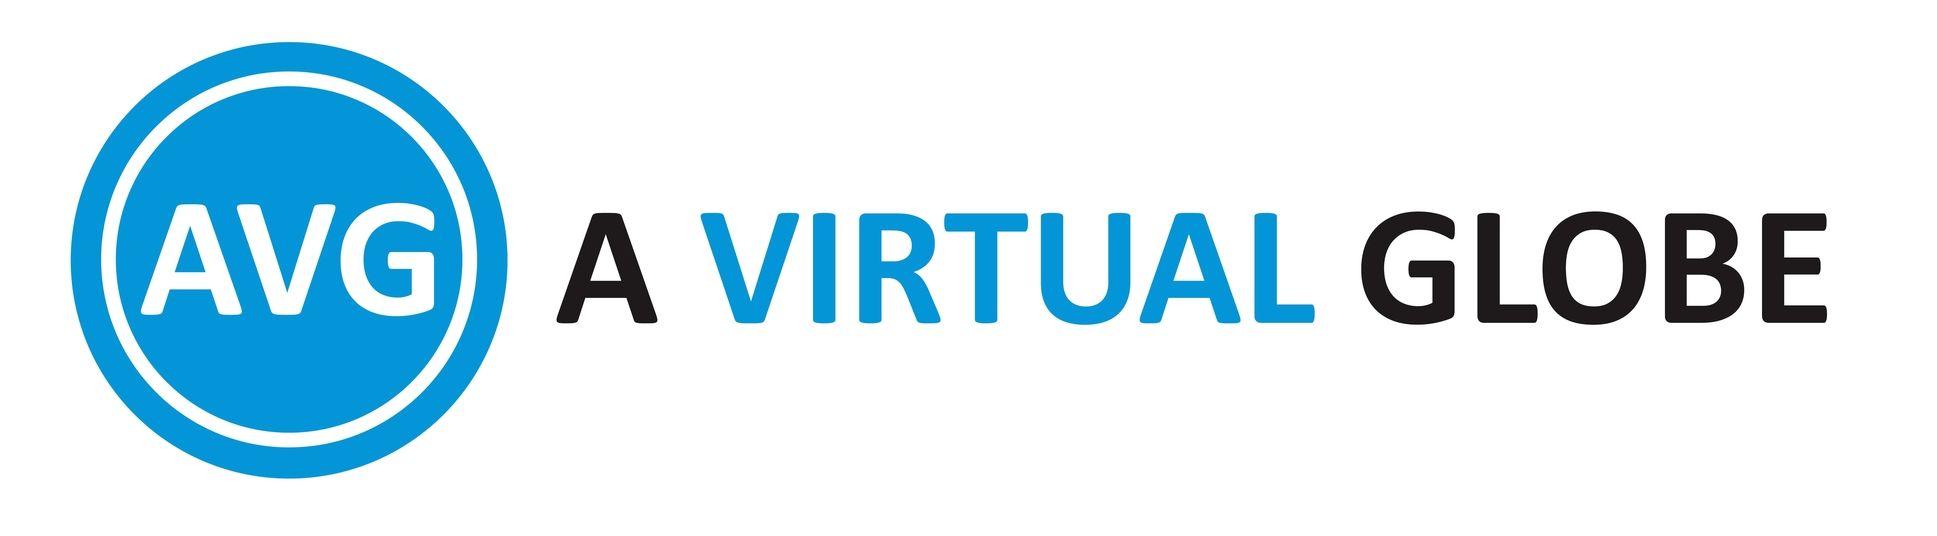 avirtualglobe Logo